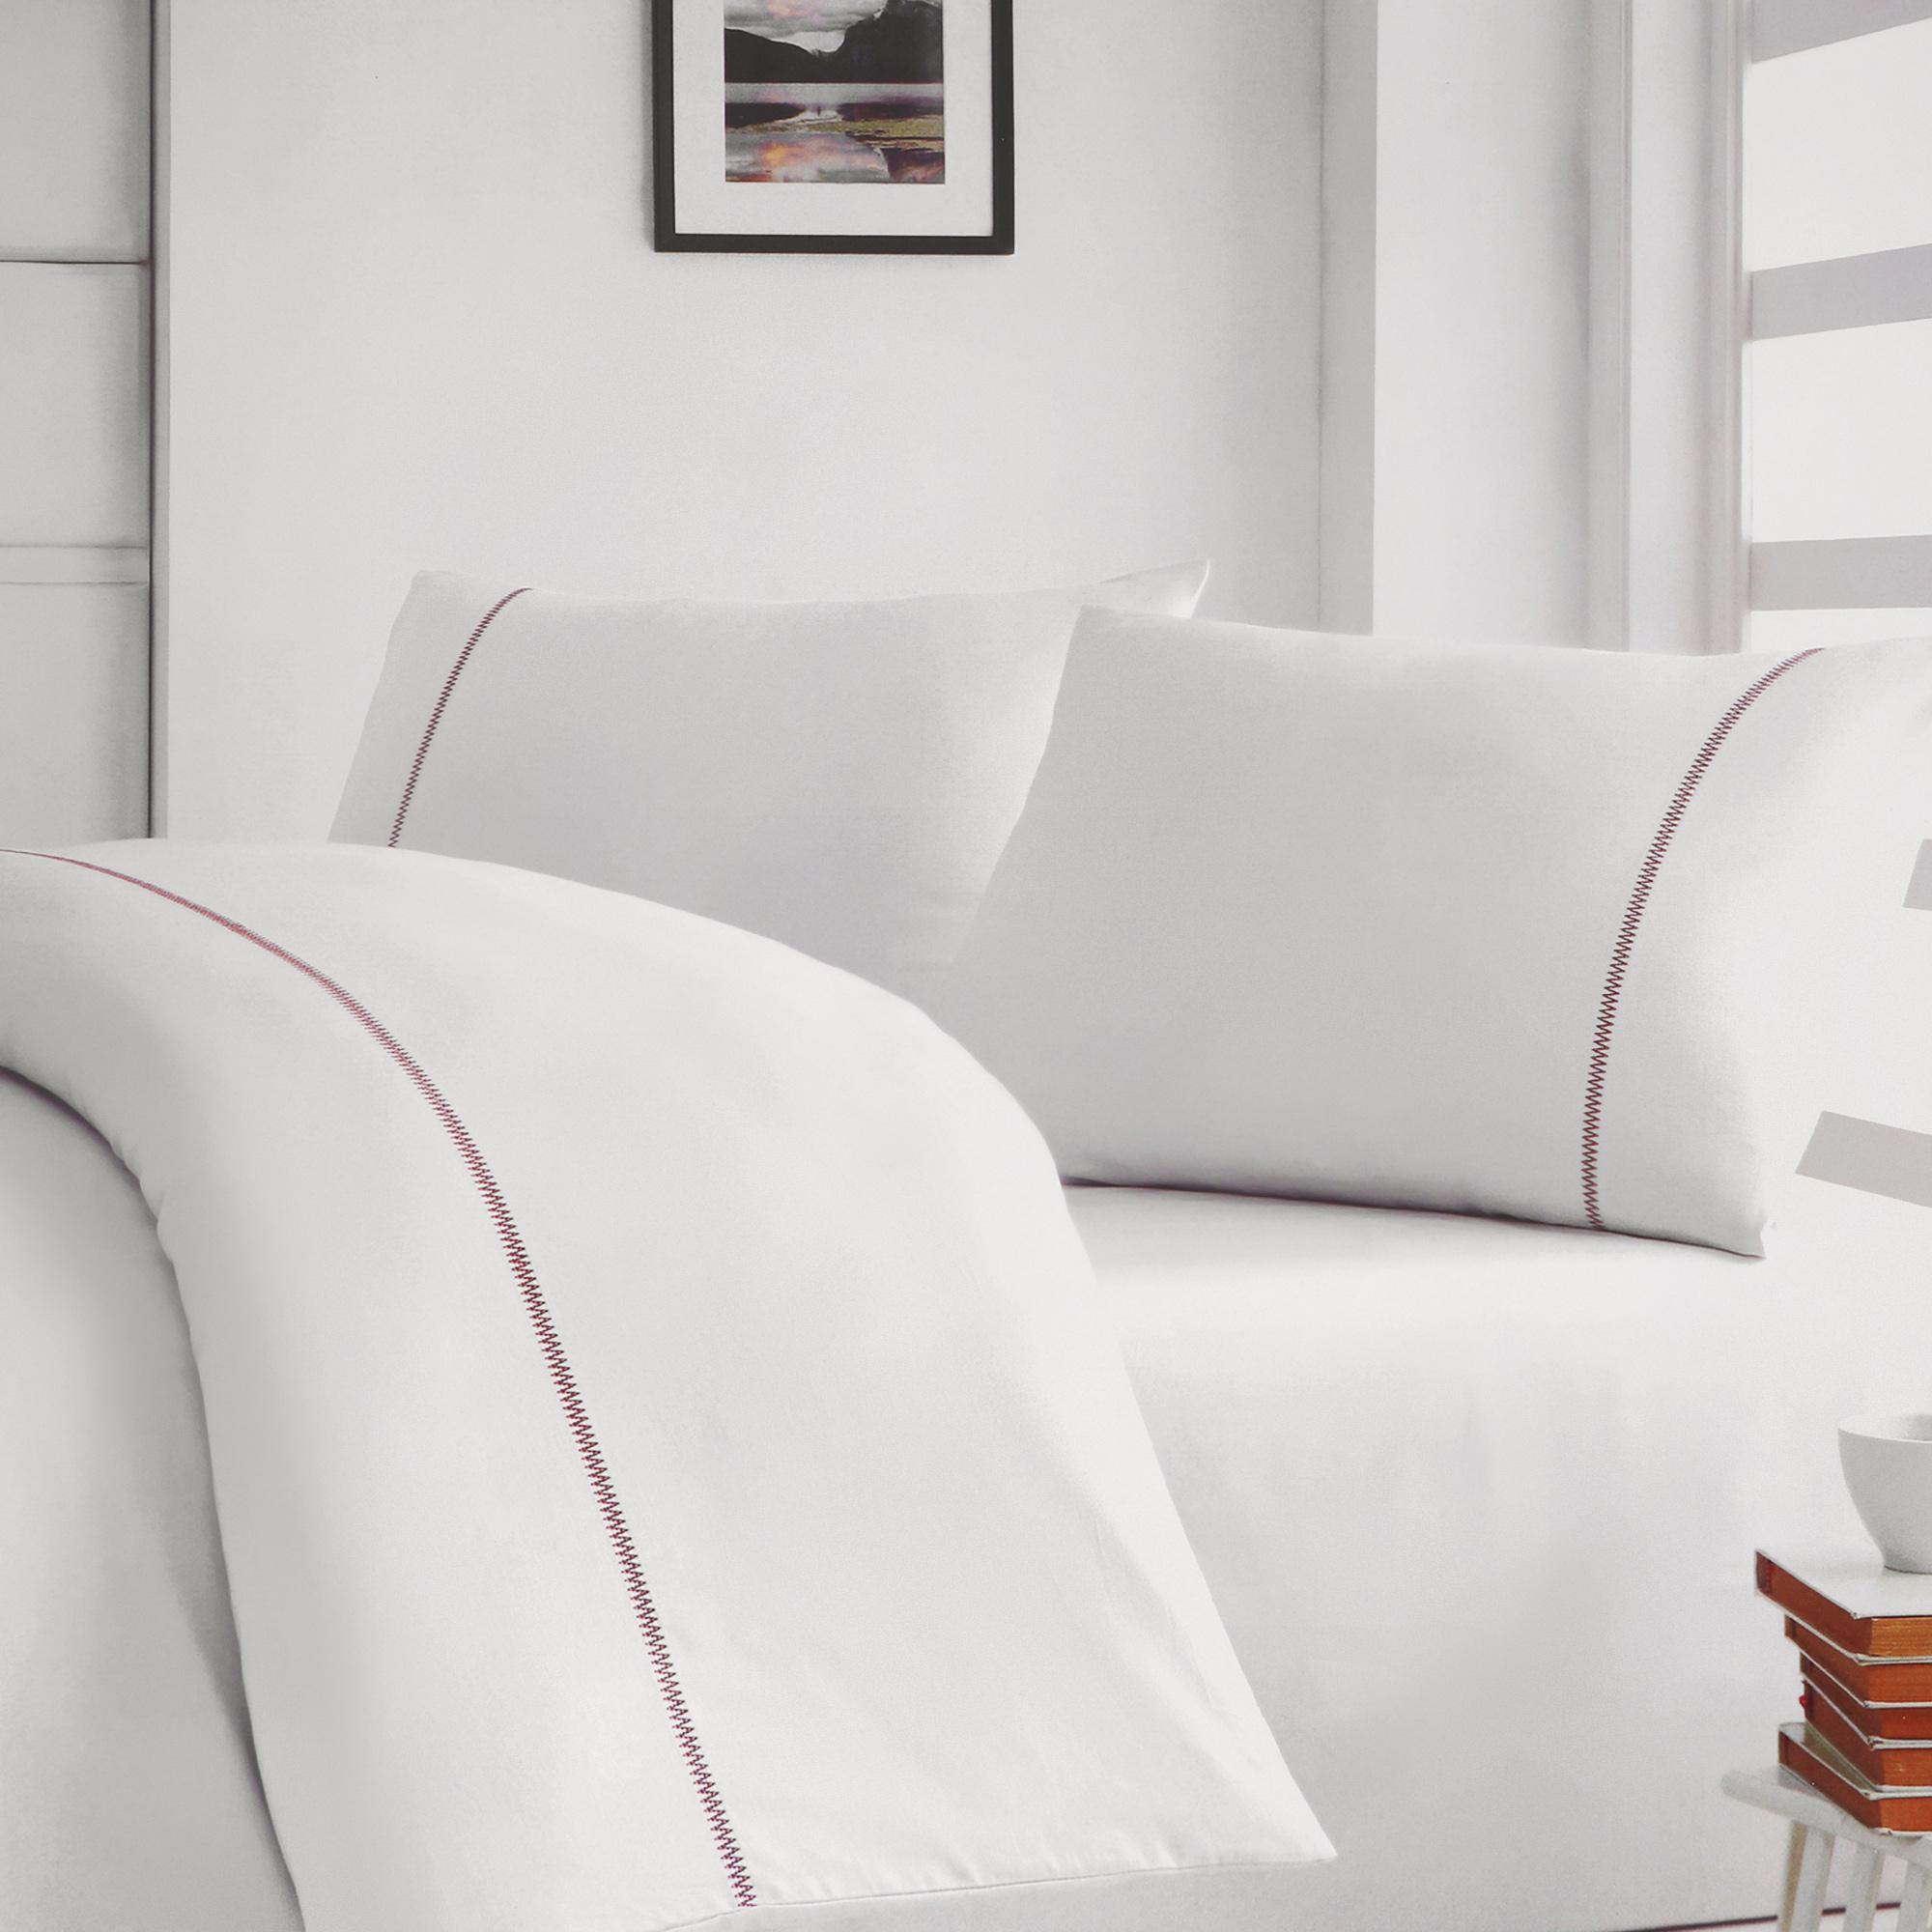 Постельный комплект Bella casa king size white / beige stripes